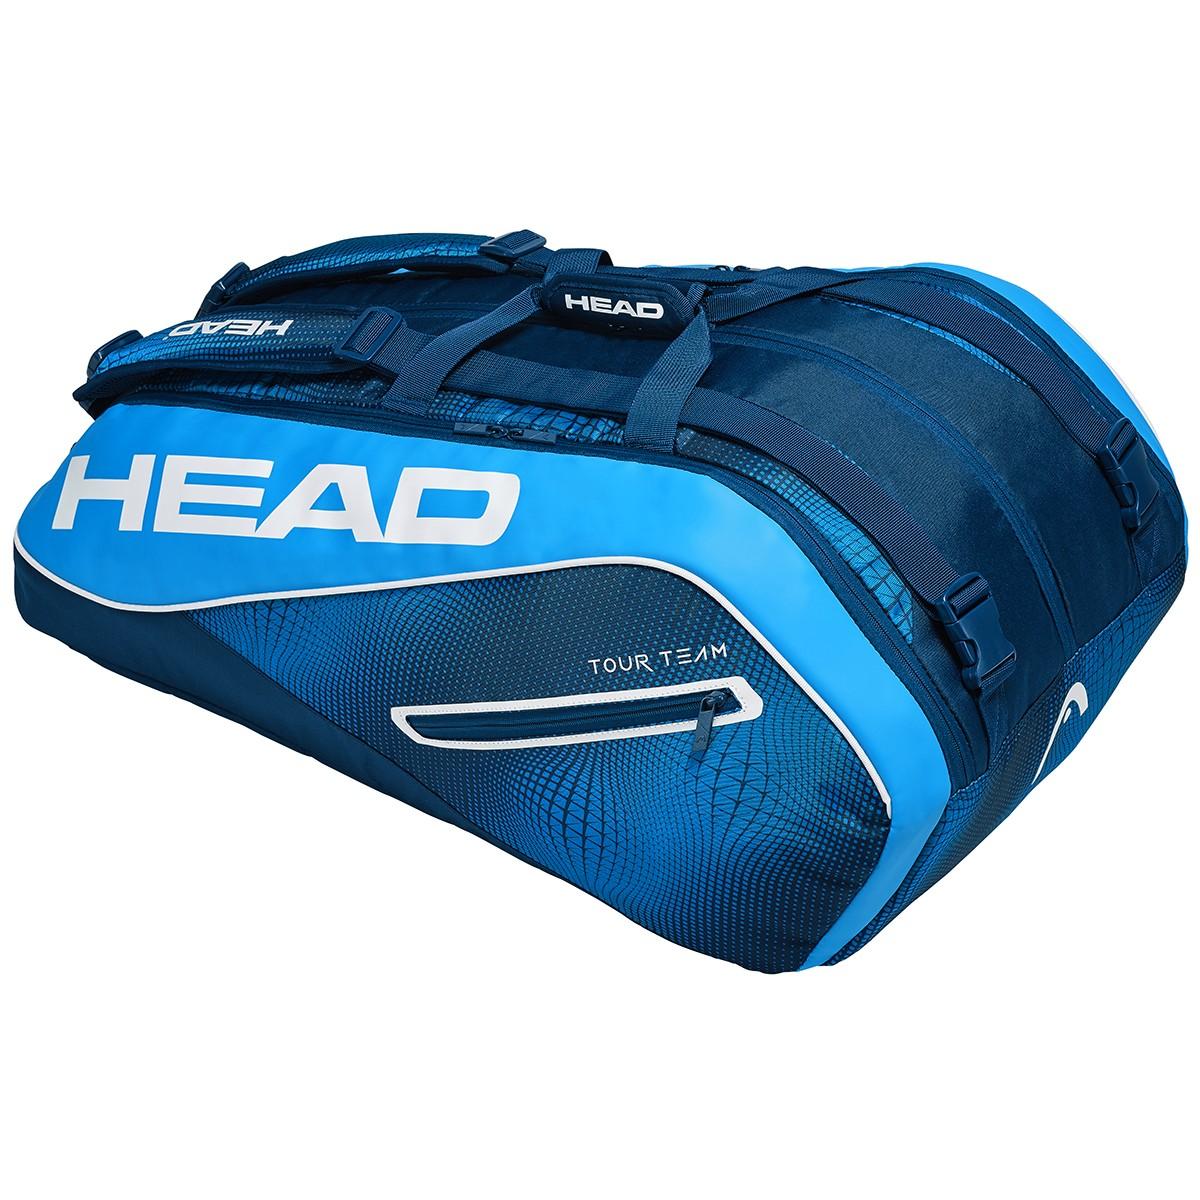 SAC DE TENNIS HEAD TOUR TEAM 12R MONSTERCOMBI